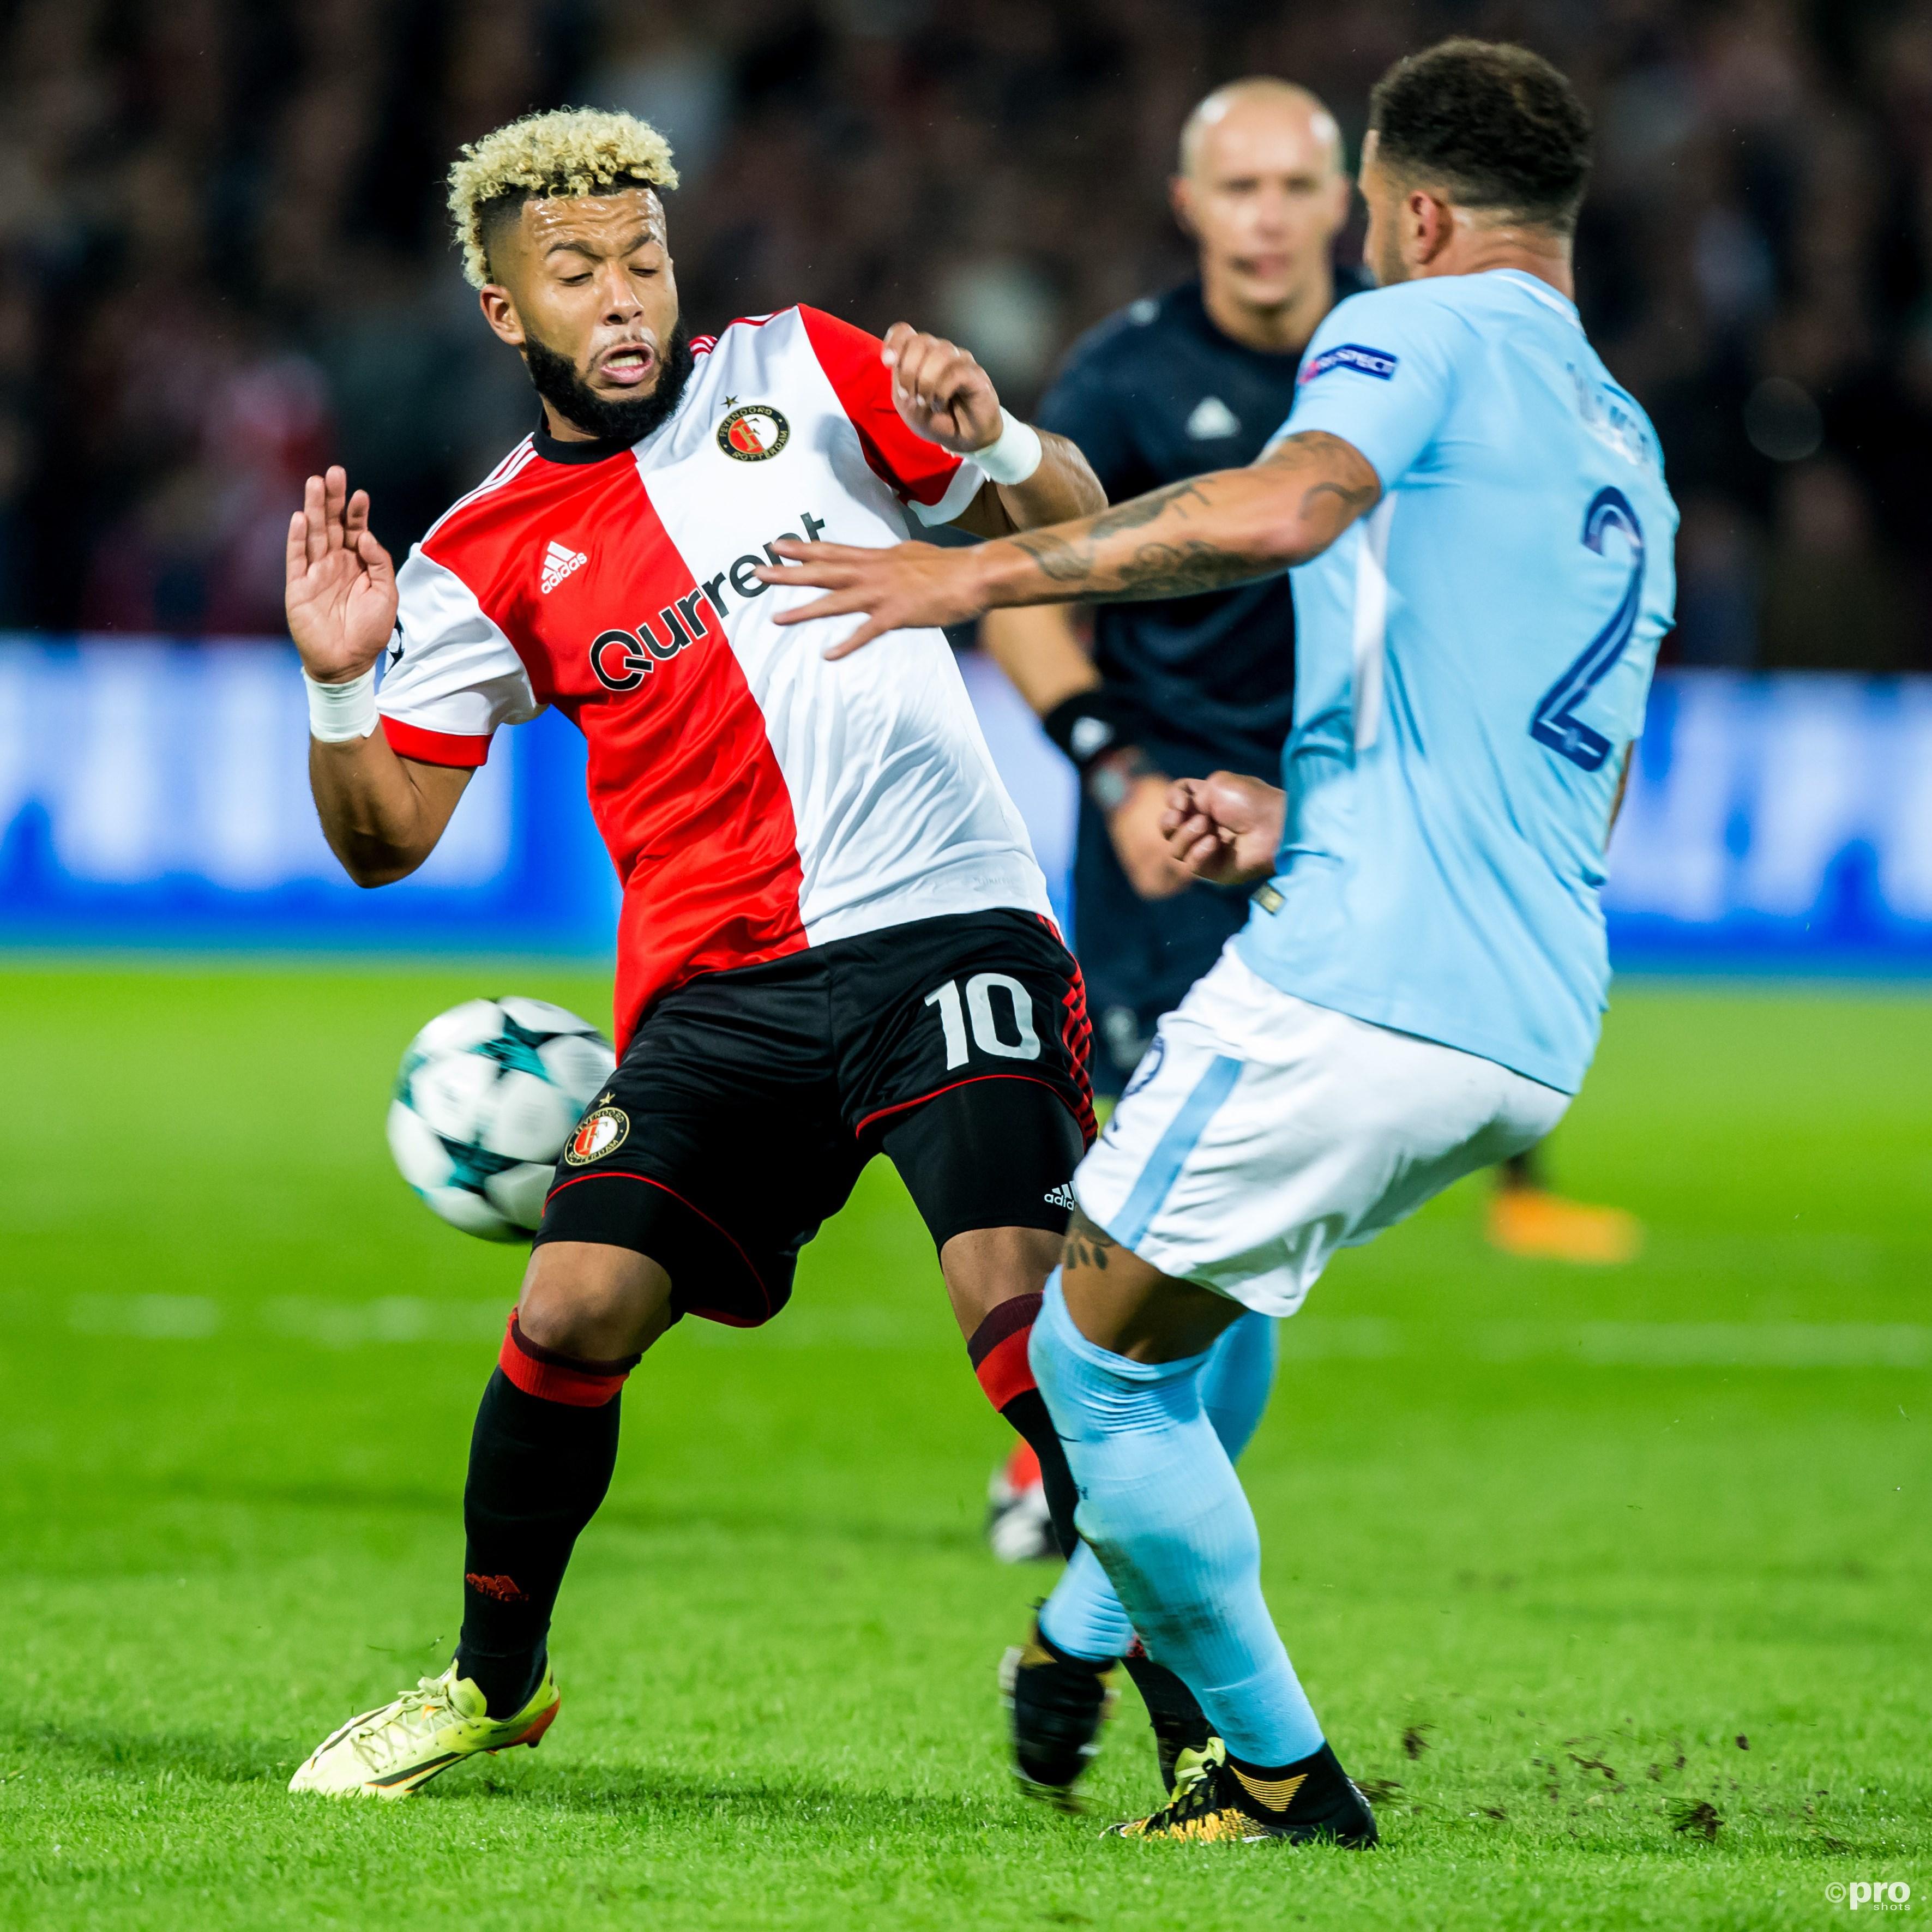 Feyenoord-speler Tonny Vilhena (l) in duel met Manchester City-speler Kyle Walker (r). (PRO SHOTS/Kay Int Veen)